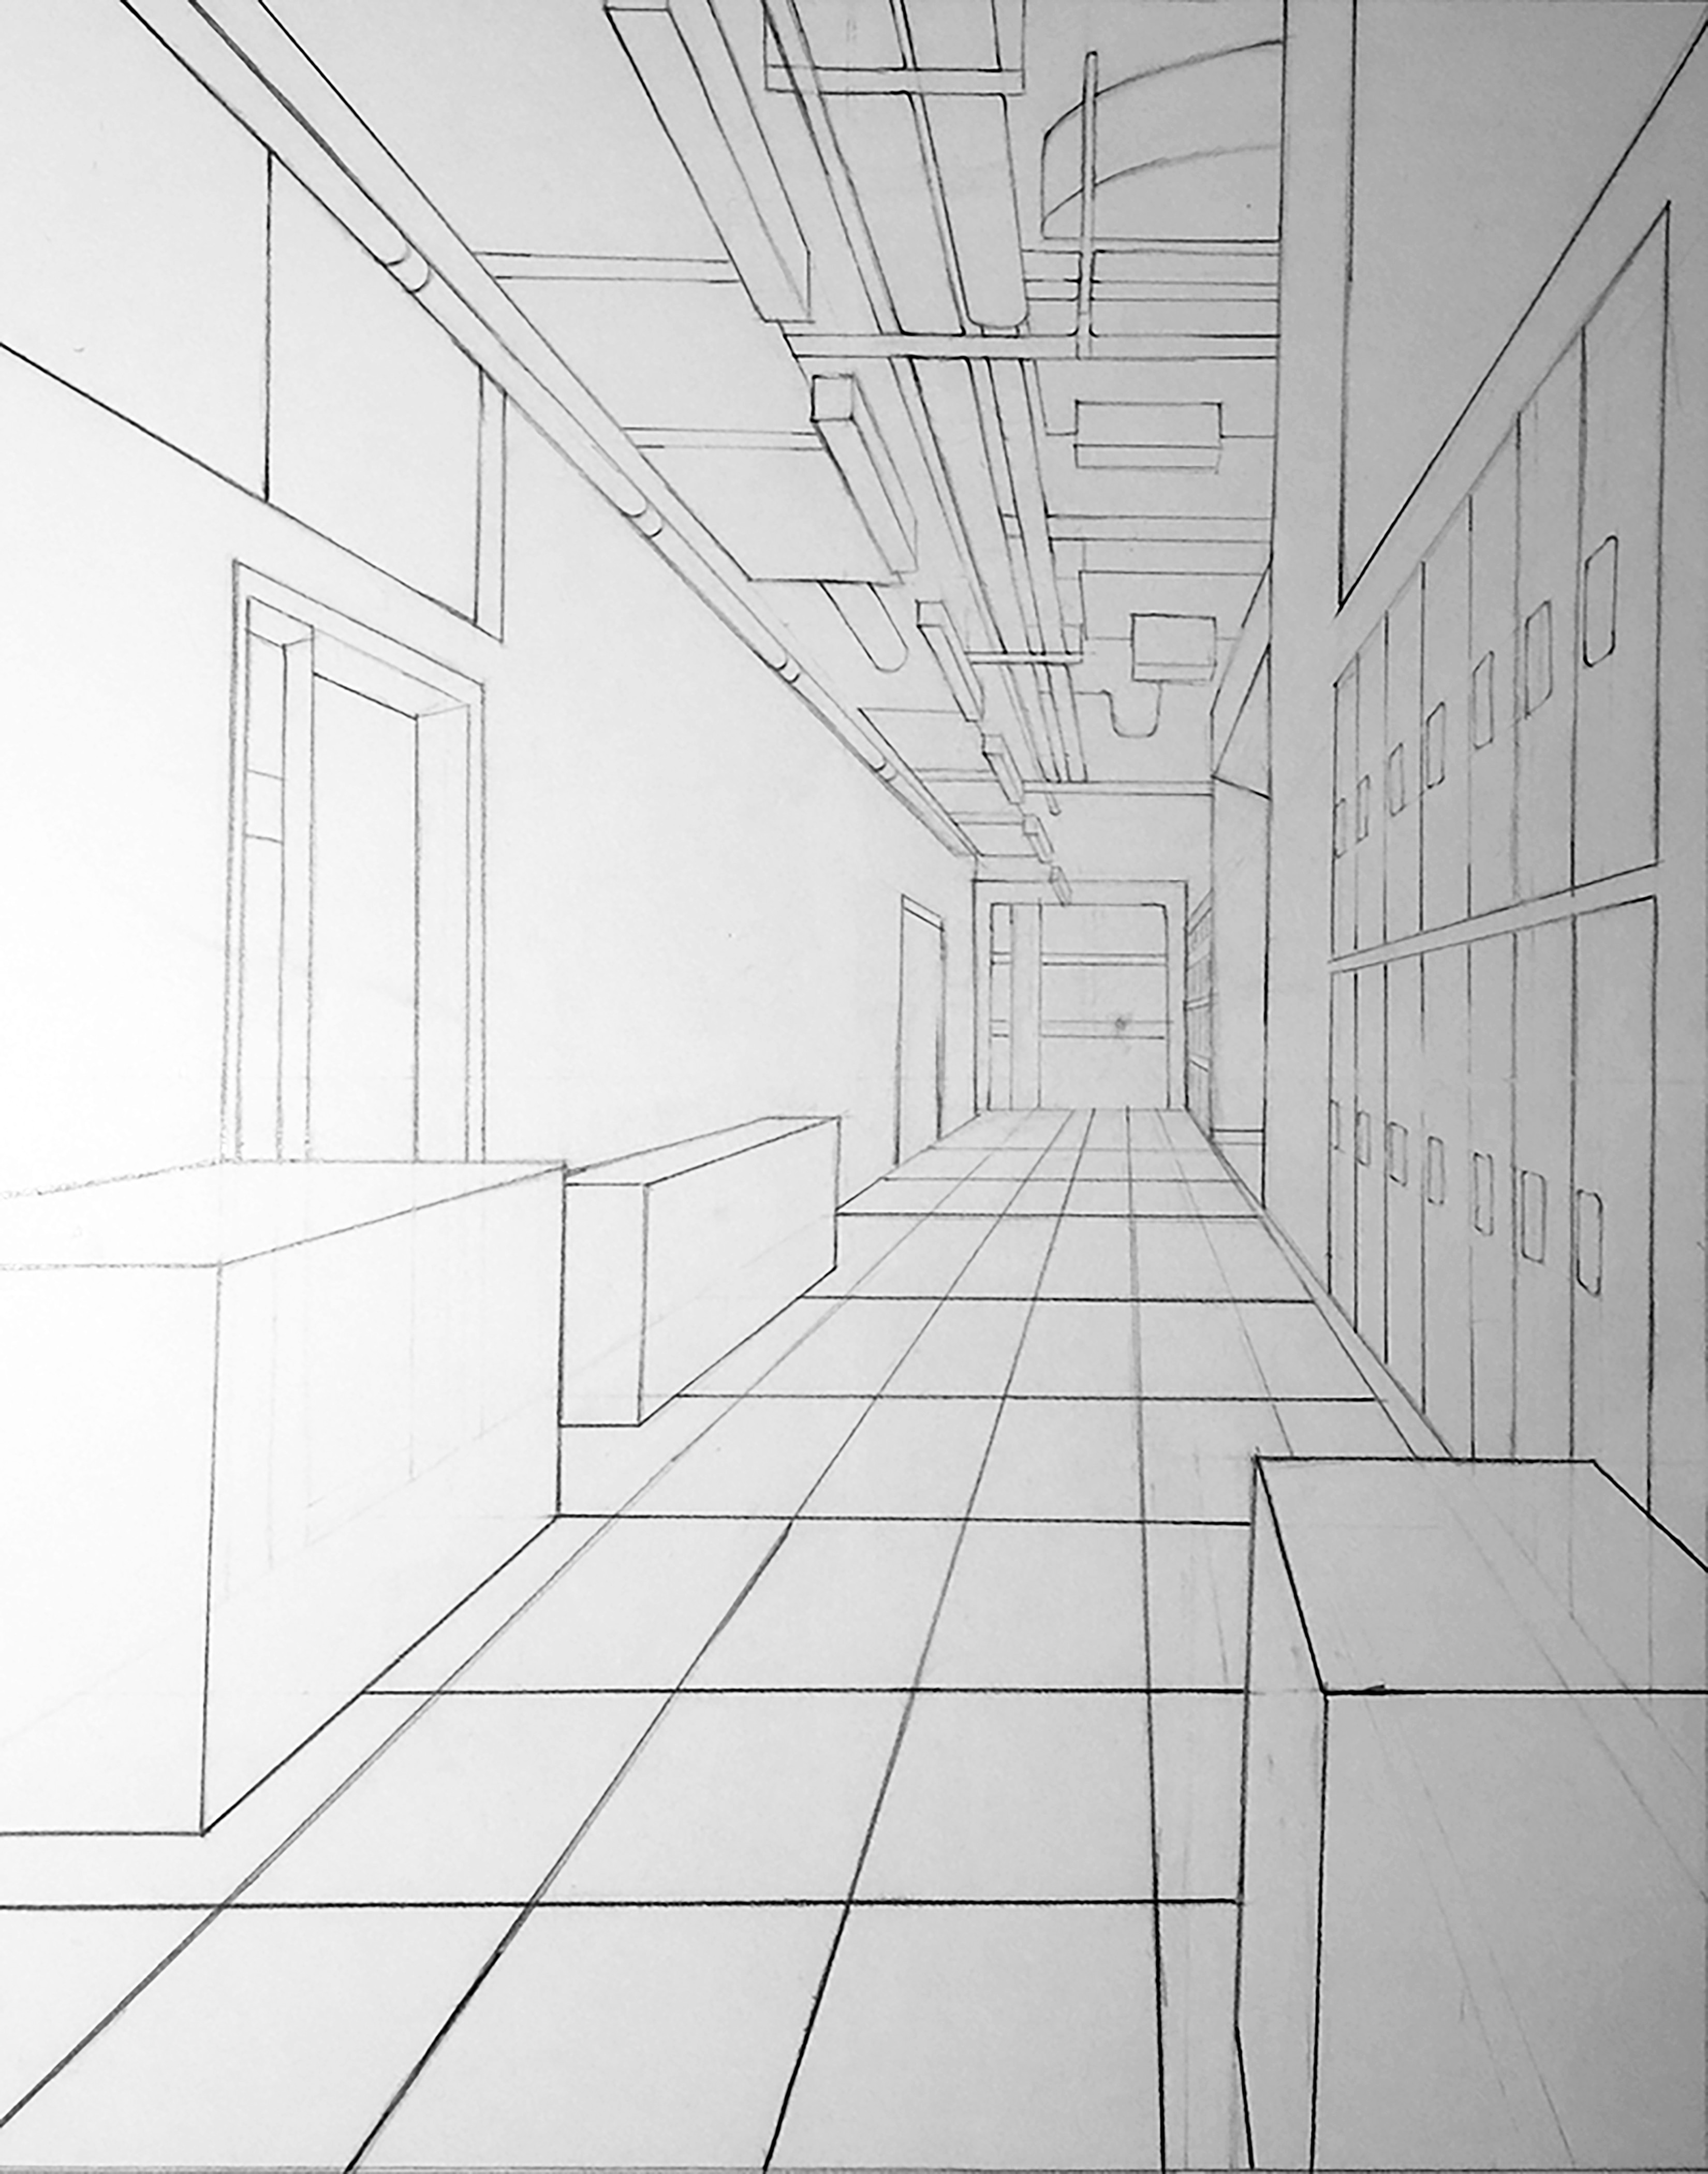 Perspectiveoriginalfinal2